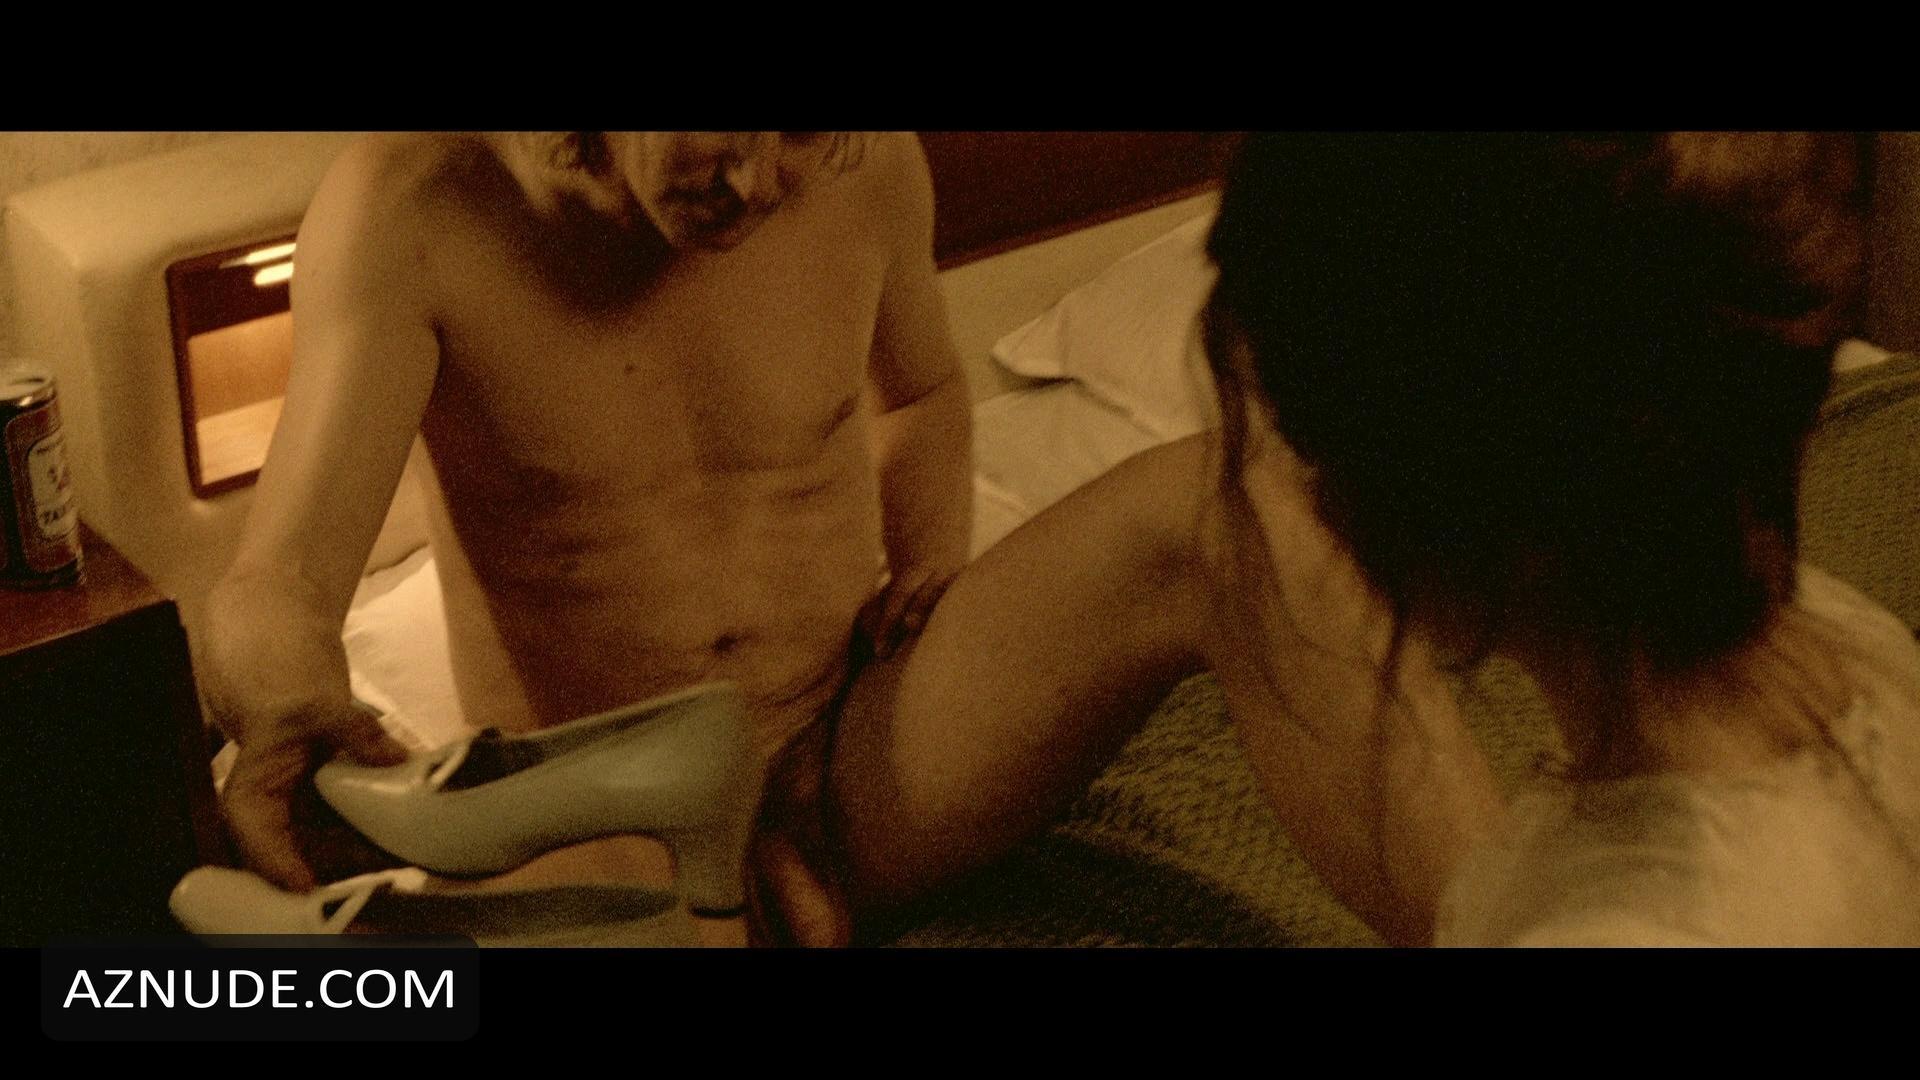 Nude women videos lesibian